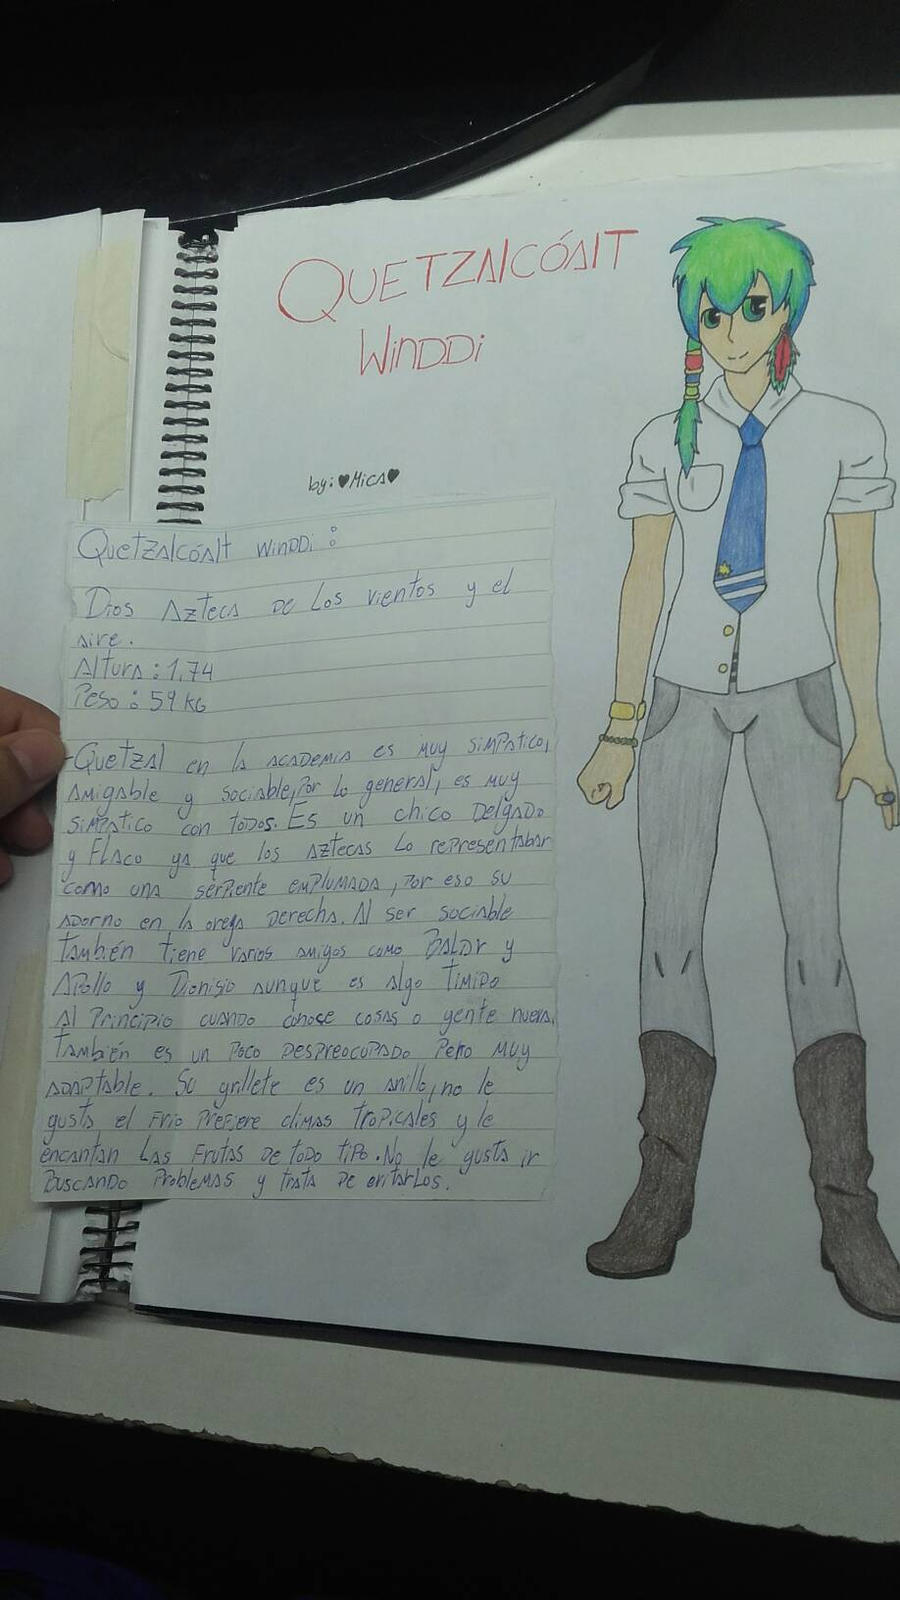 Quetzalcoalt Winddi by Mikal04-12